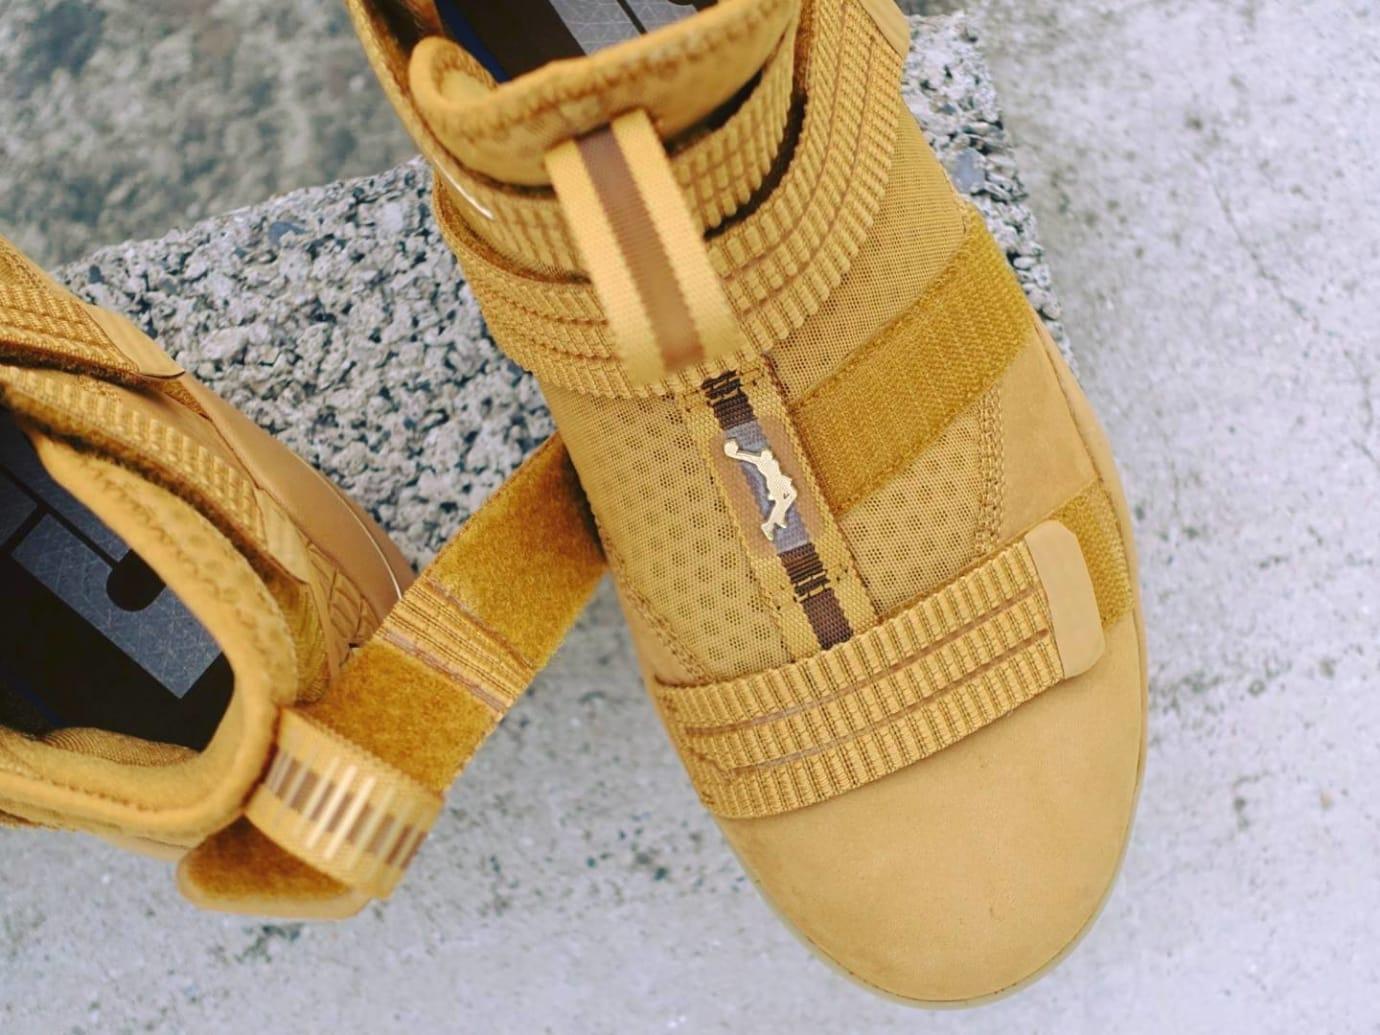 e753836dc3b Nike LeBron Soldier 11 SFG Wheat Release Date 897647-700 (2)